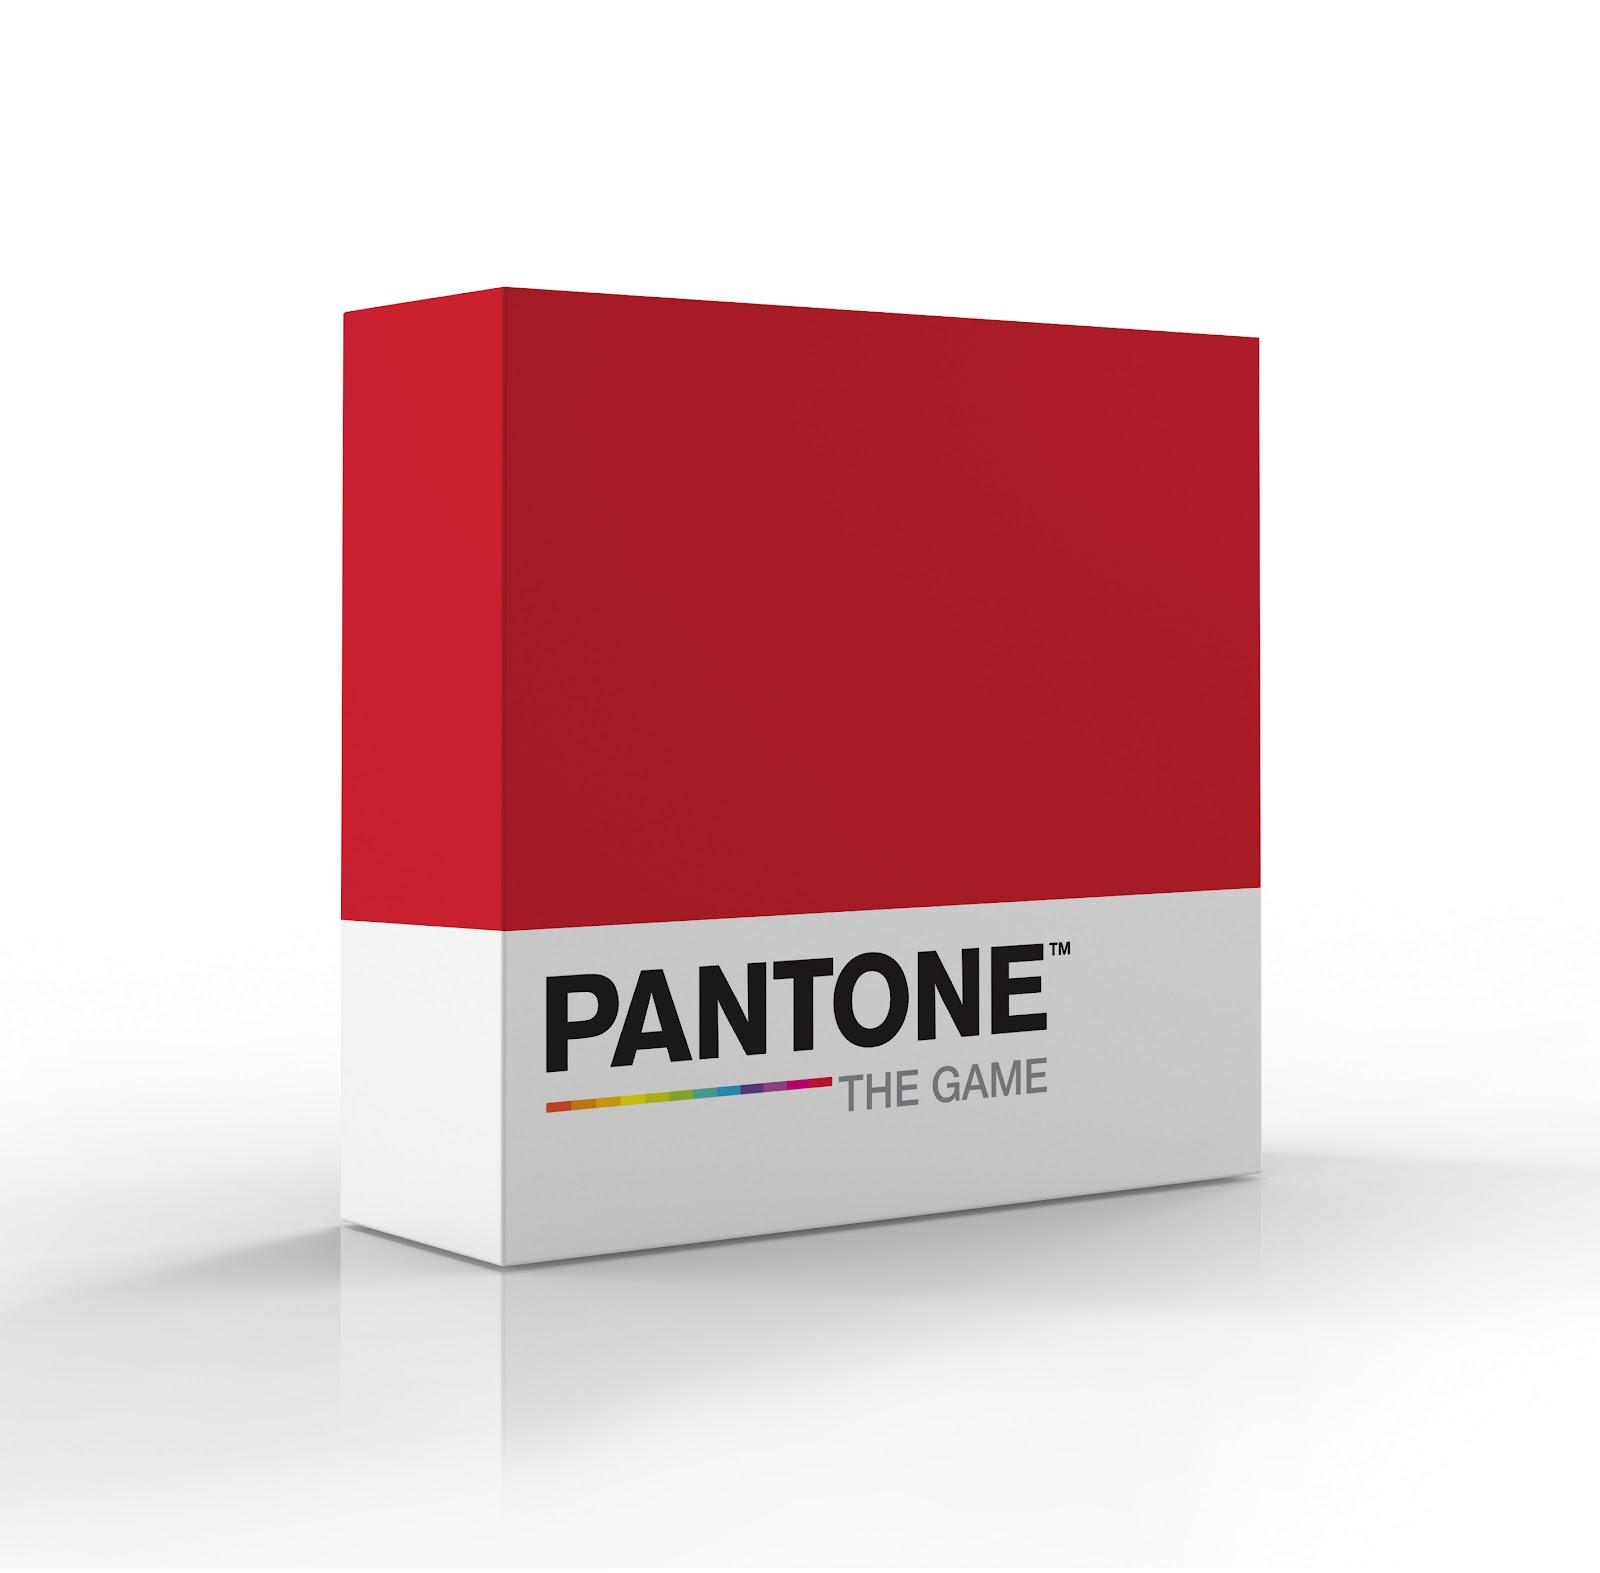 Pantone: The Game box